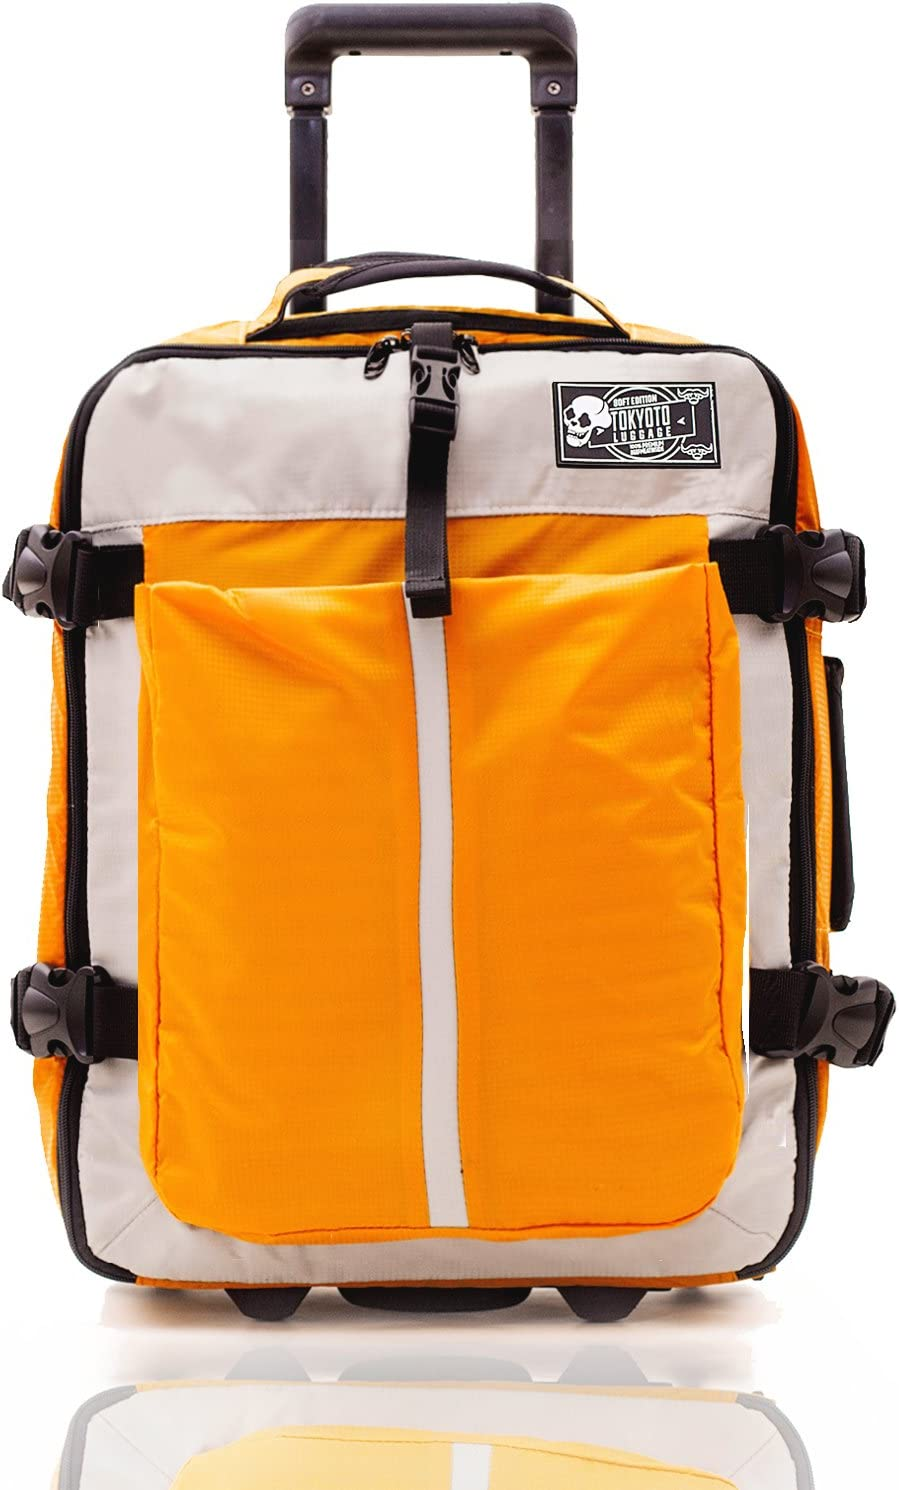 Maleta de Cabina Equipaje de Viaje de Mano Maleta Blanda de Nylon Duffel para Ryanair Easyjet 55x35x20 Trolley Juvenil by TOKYOTO Luggage 52cm Sof Yellow